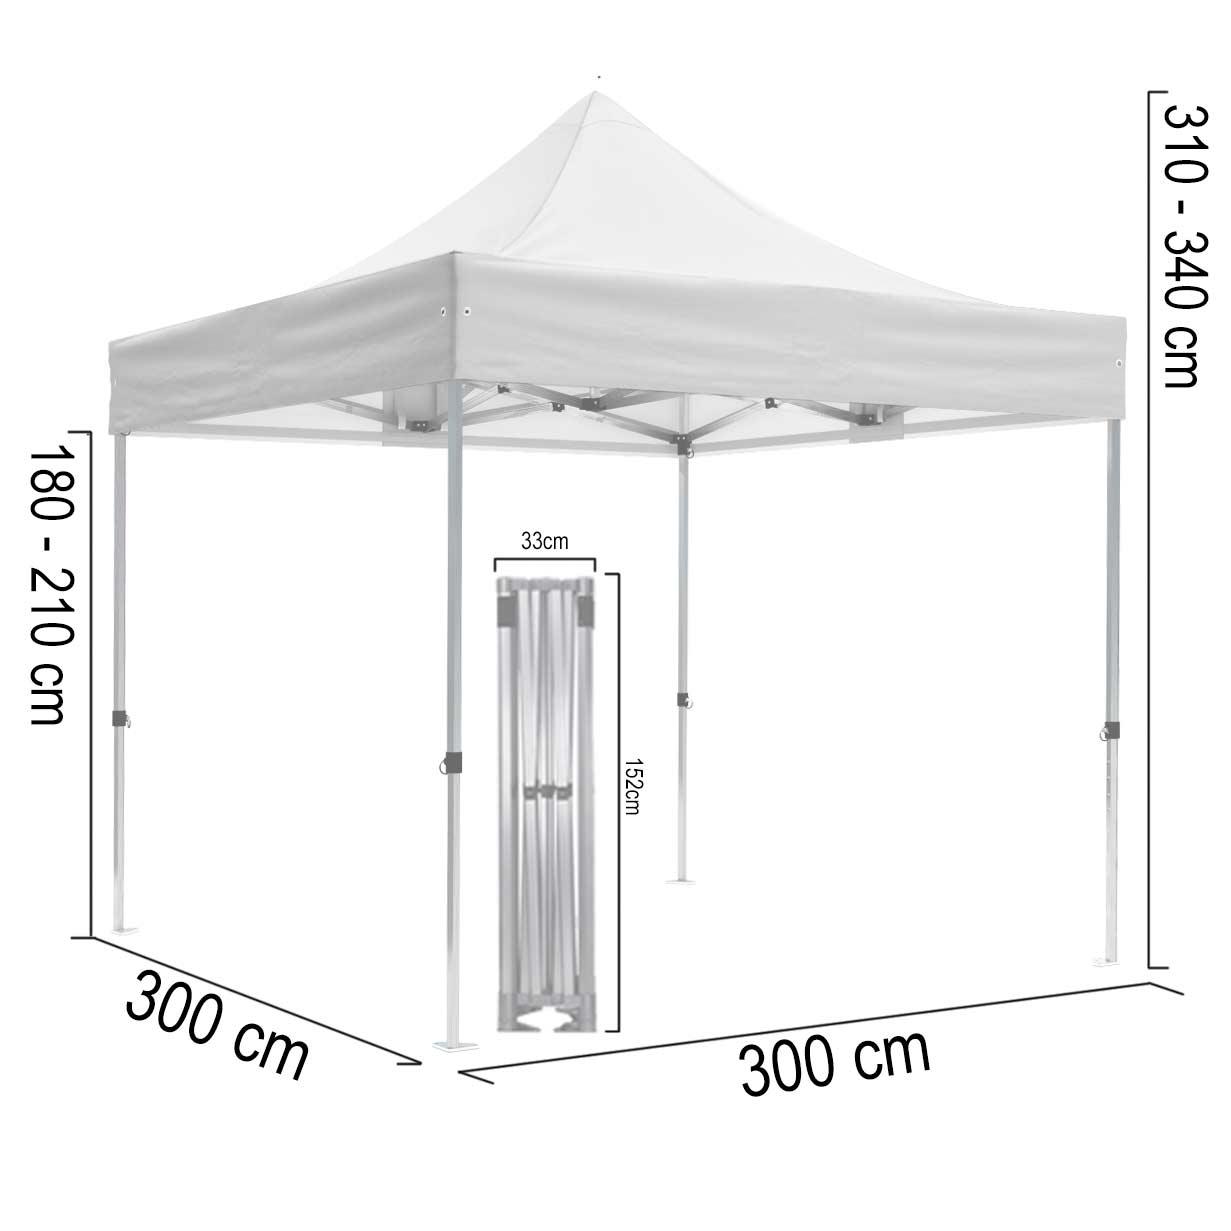 Faltpavillon-Abmessungen-Hexa50